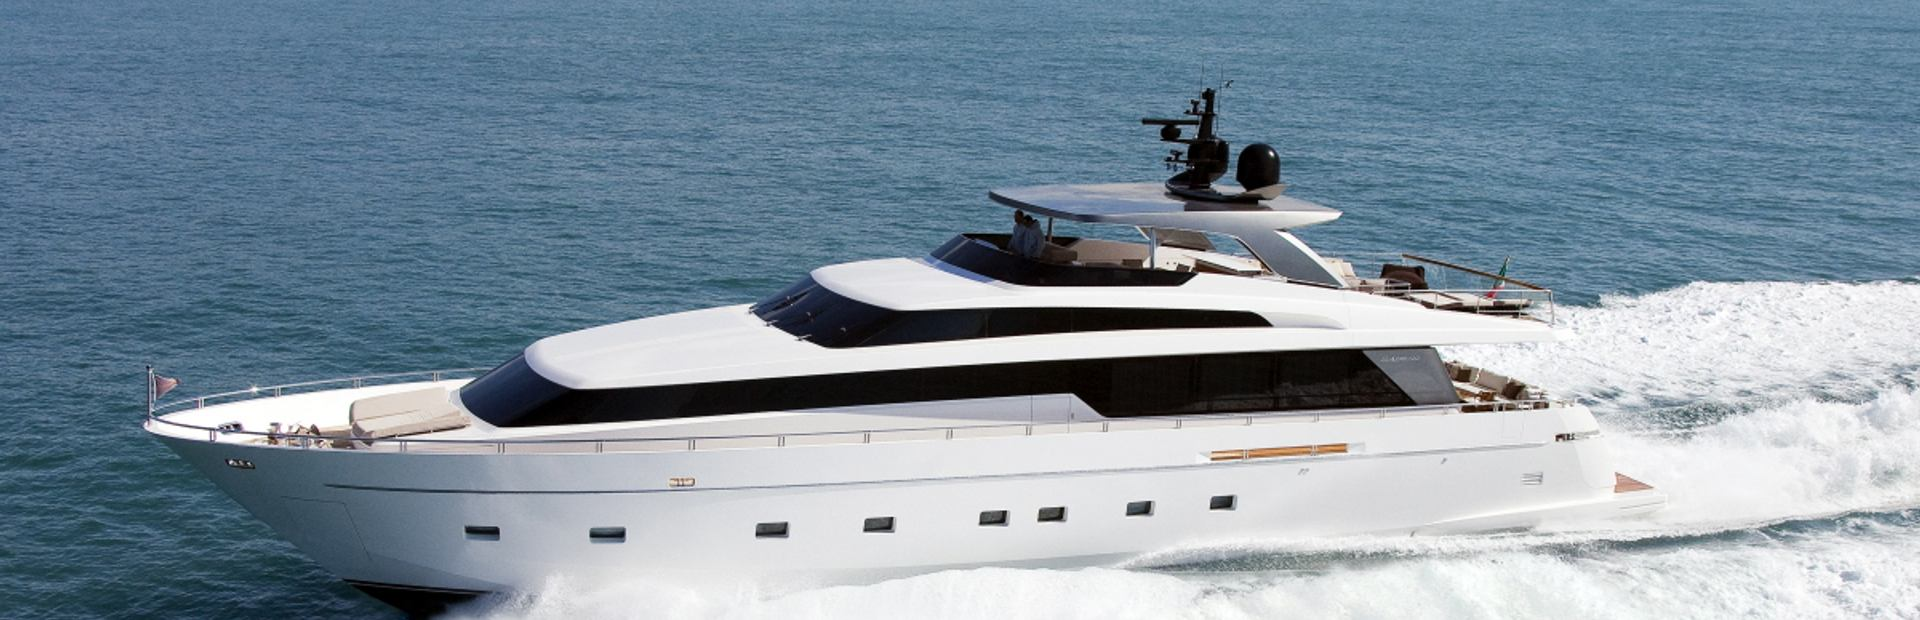 SL100 Yacht Charter